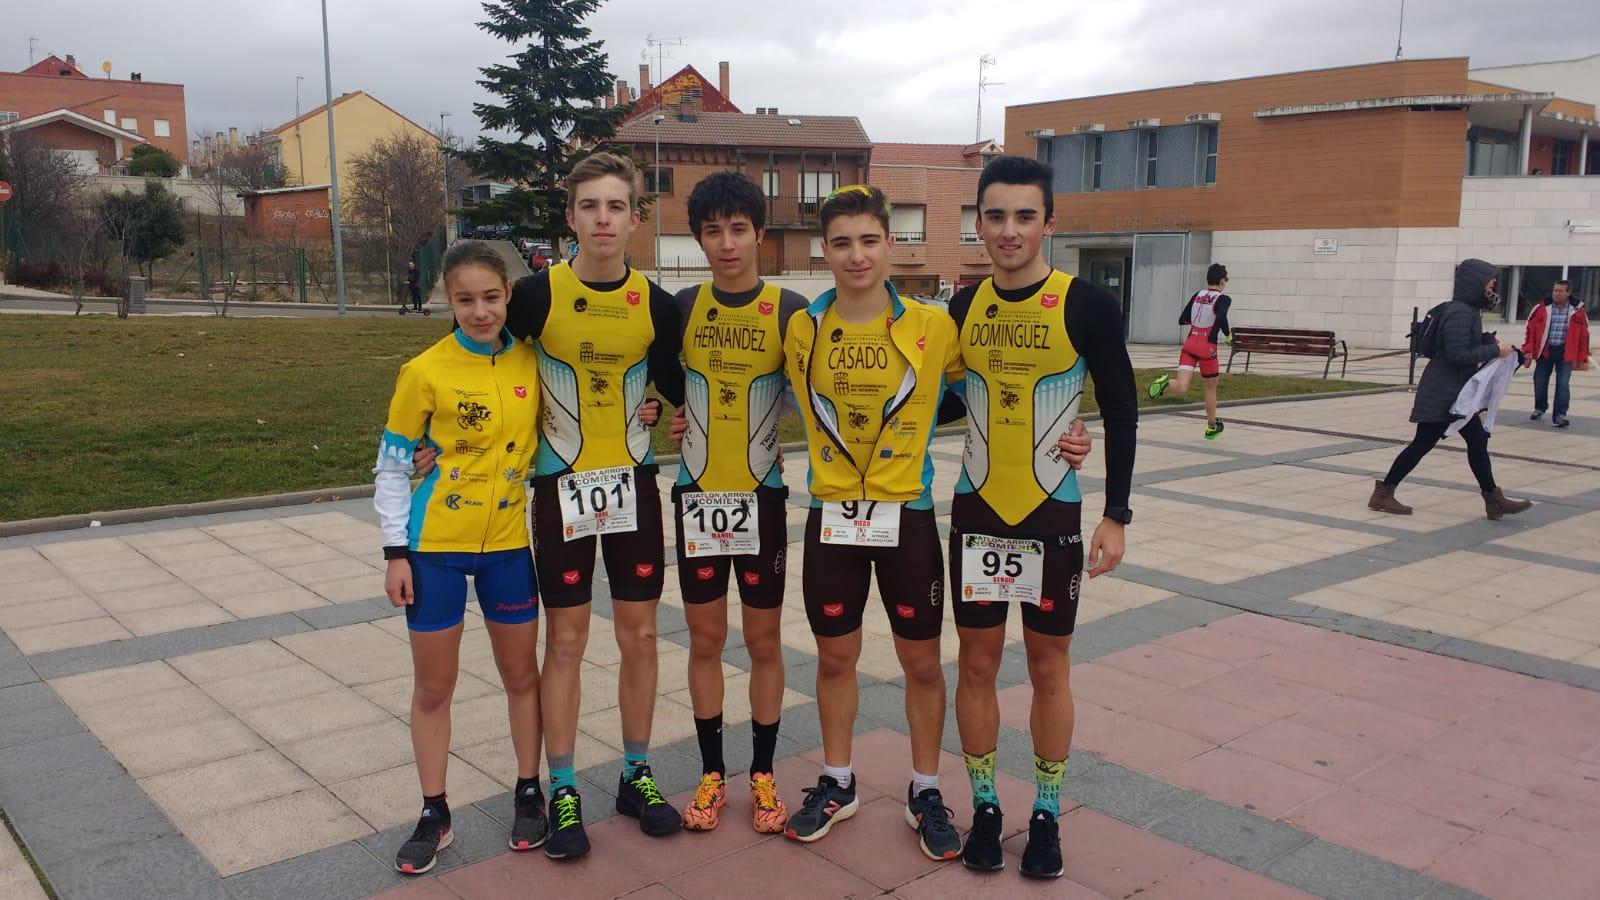 Club Triatlón IMD Segovia: Crónica del Fin de Semana